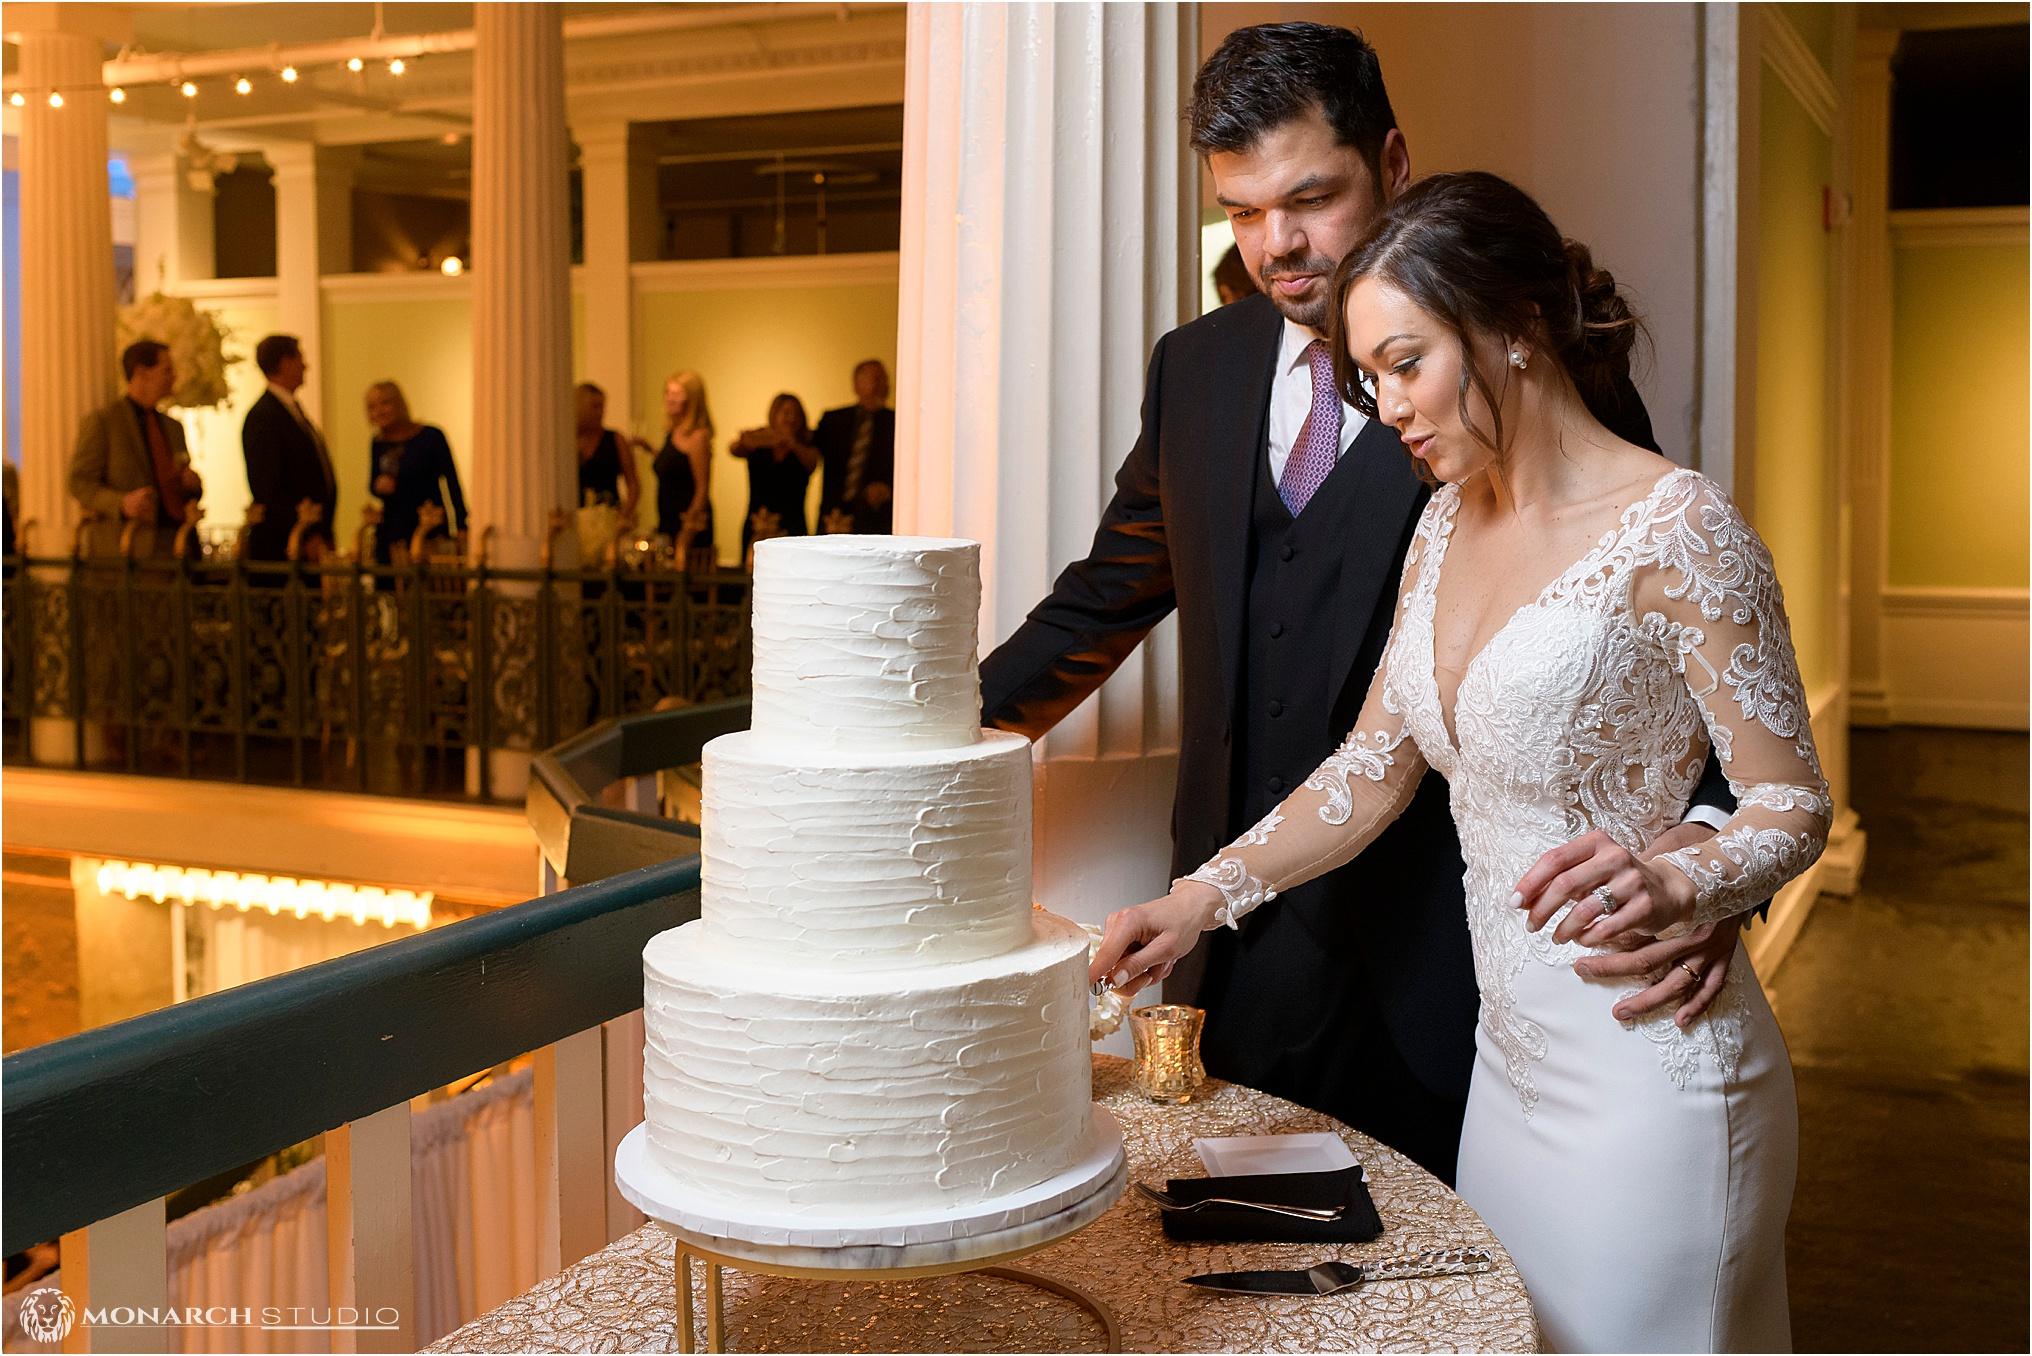 st-augustine-high-end-wedding-photographers-128.jpg